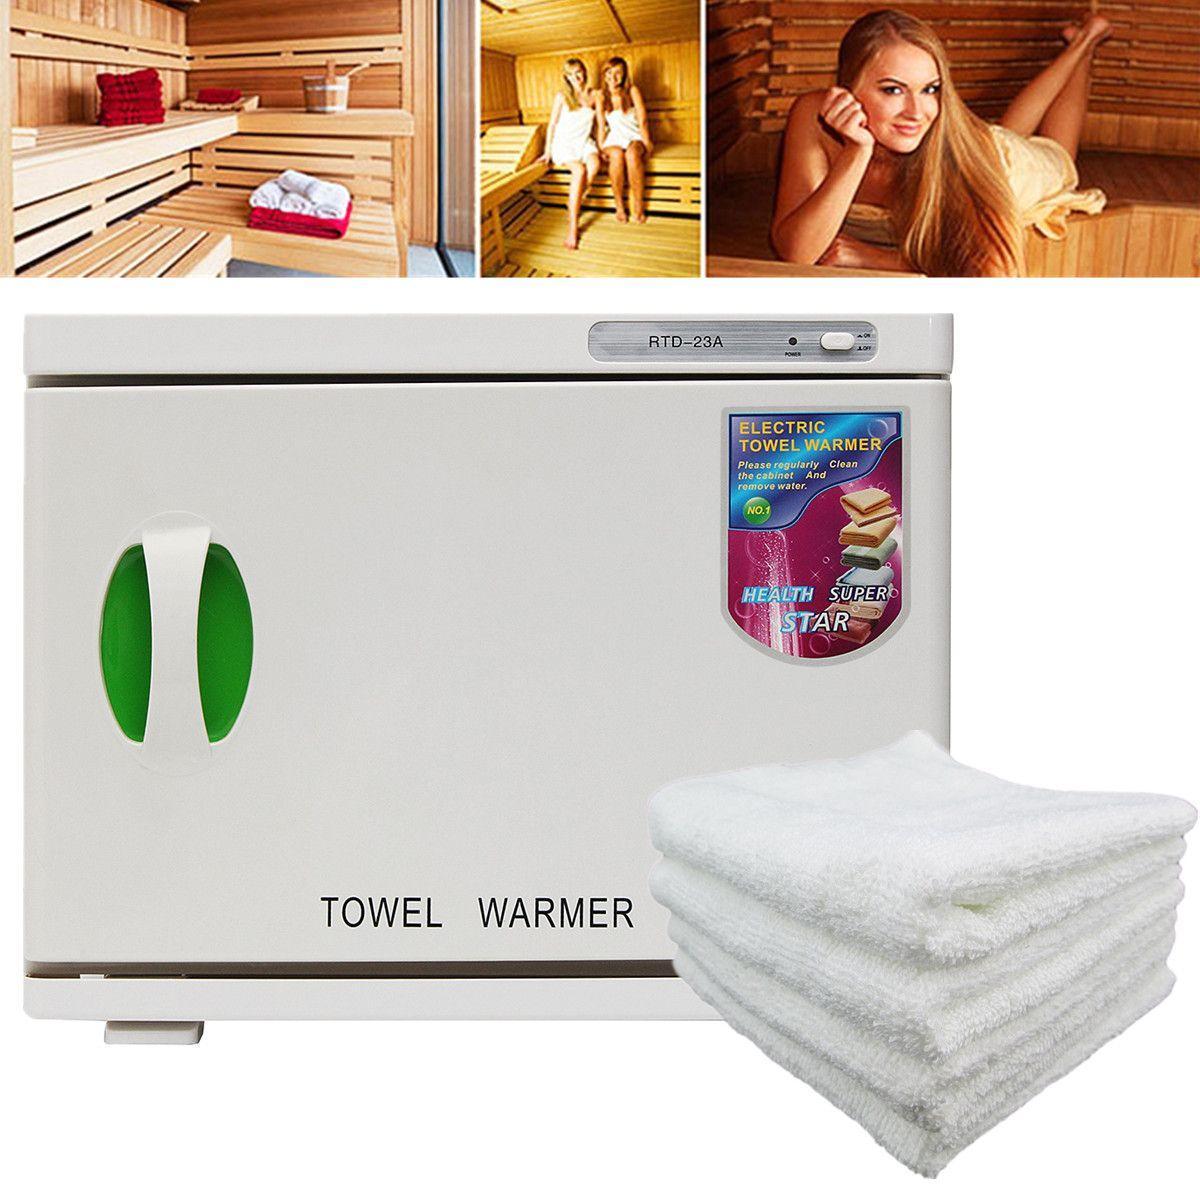 Hot Facial Towel Warmer UV Sterilizer 23L 100-240V/AC Cabinet HDisinfection Beauty Salon Spa Heating Sterilizer Storage Towel